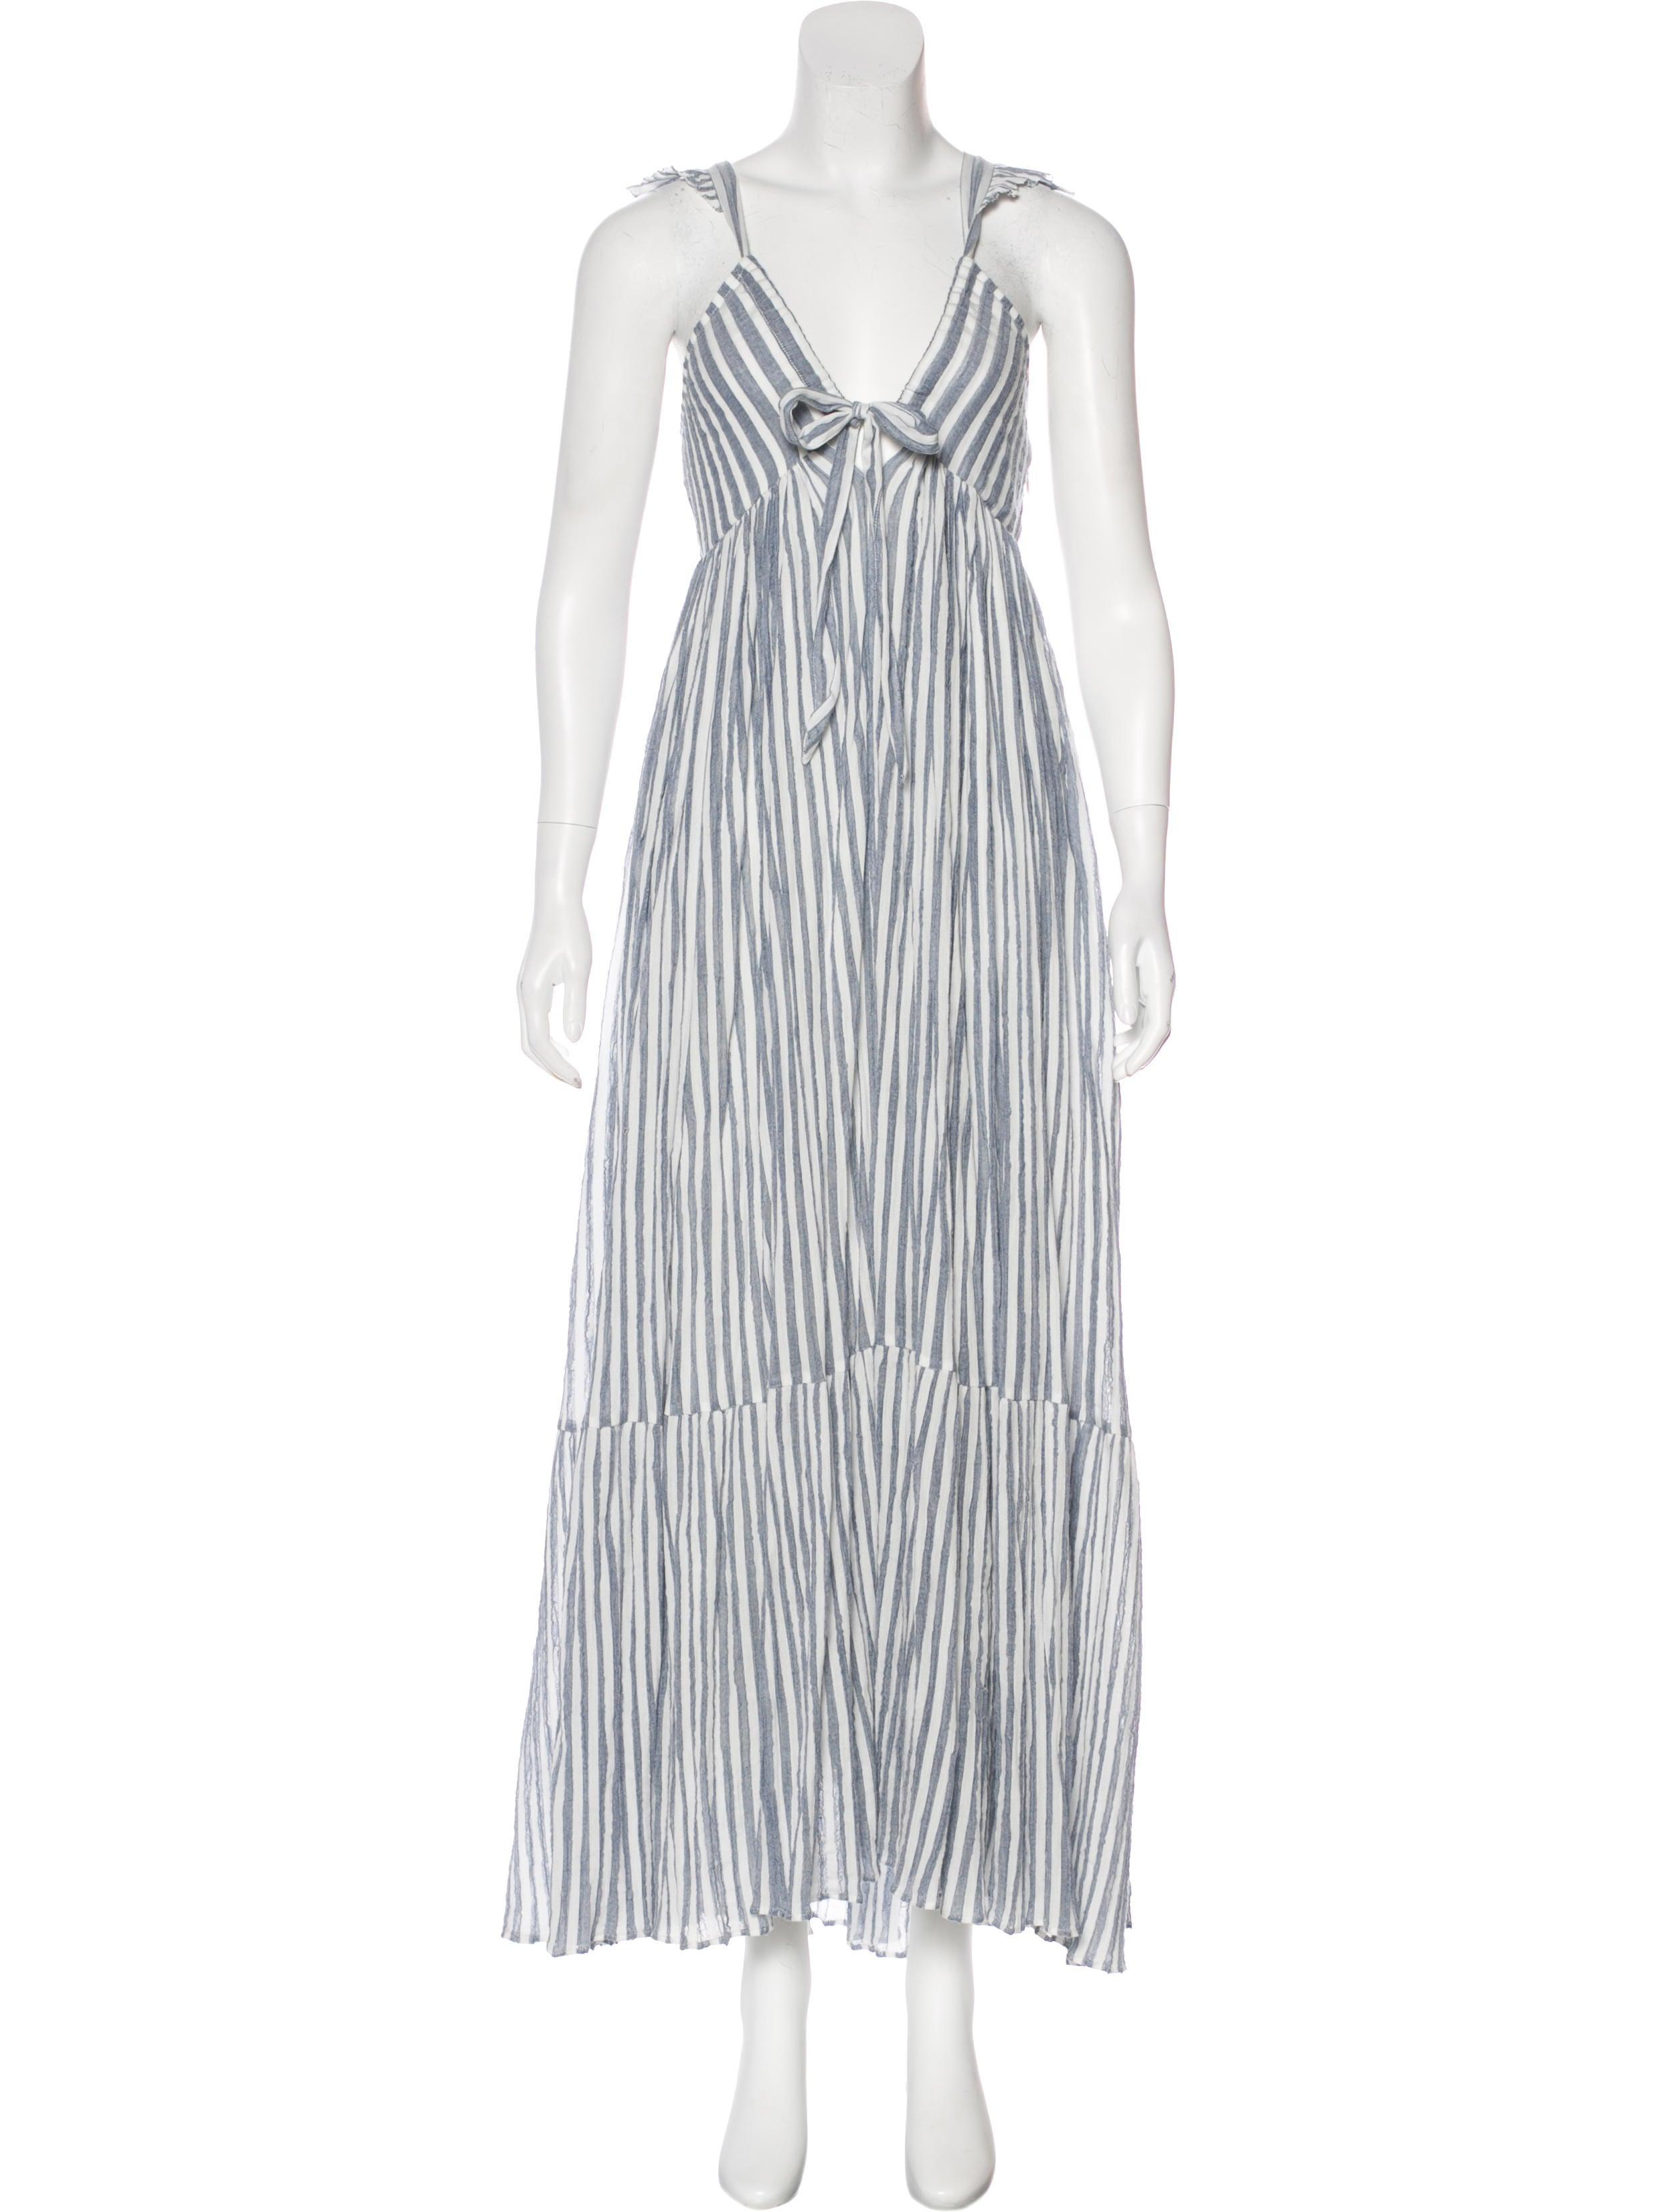 Ulla Johnson Striped Maxi Dress Clothing WUL24637